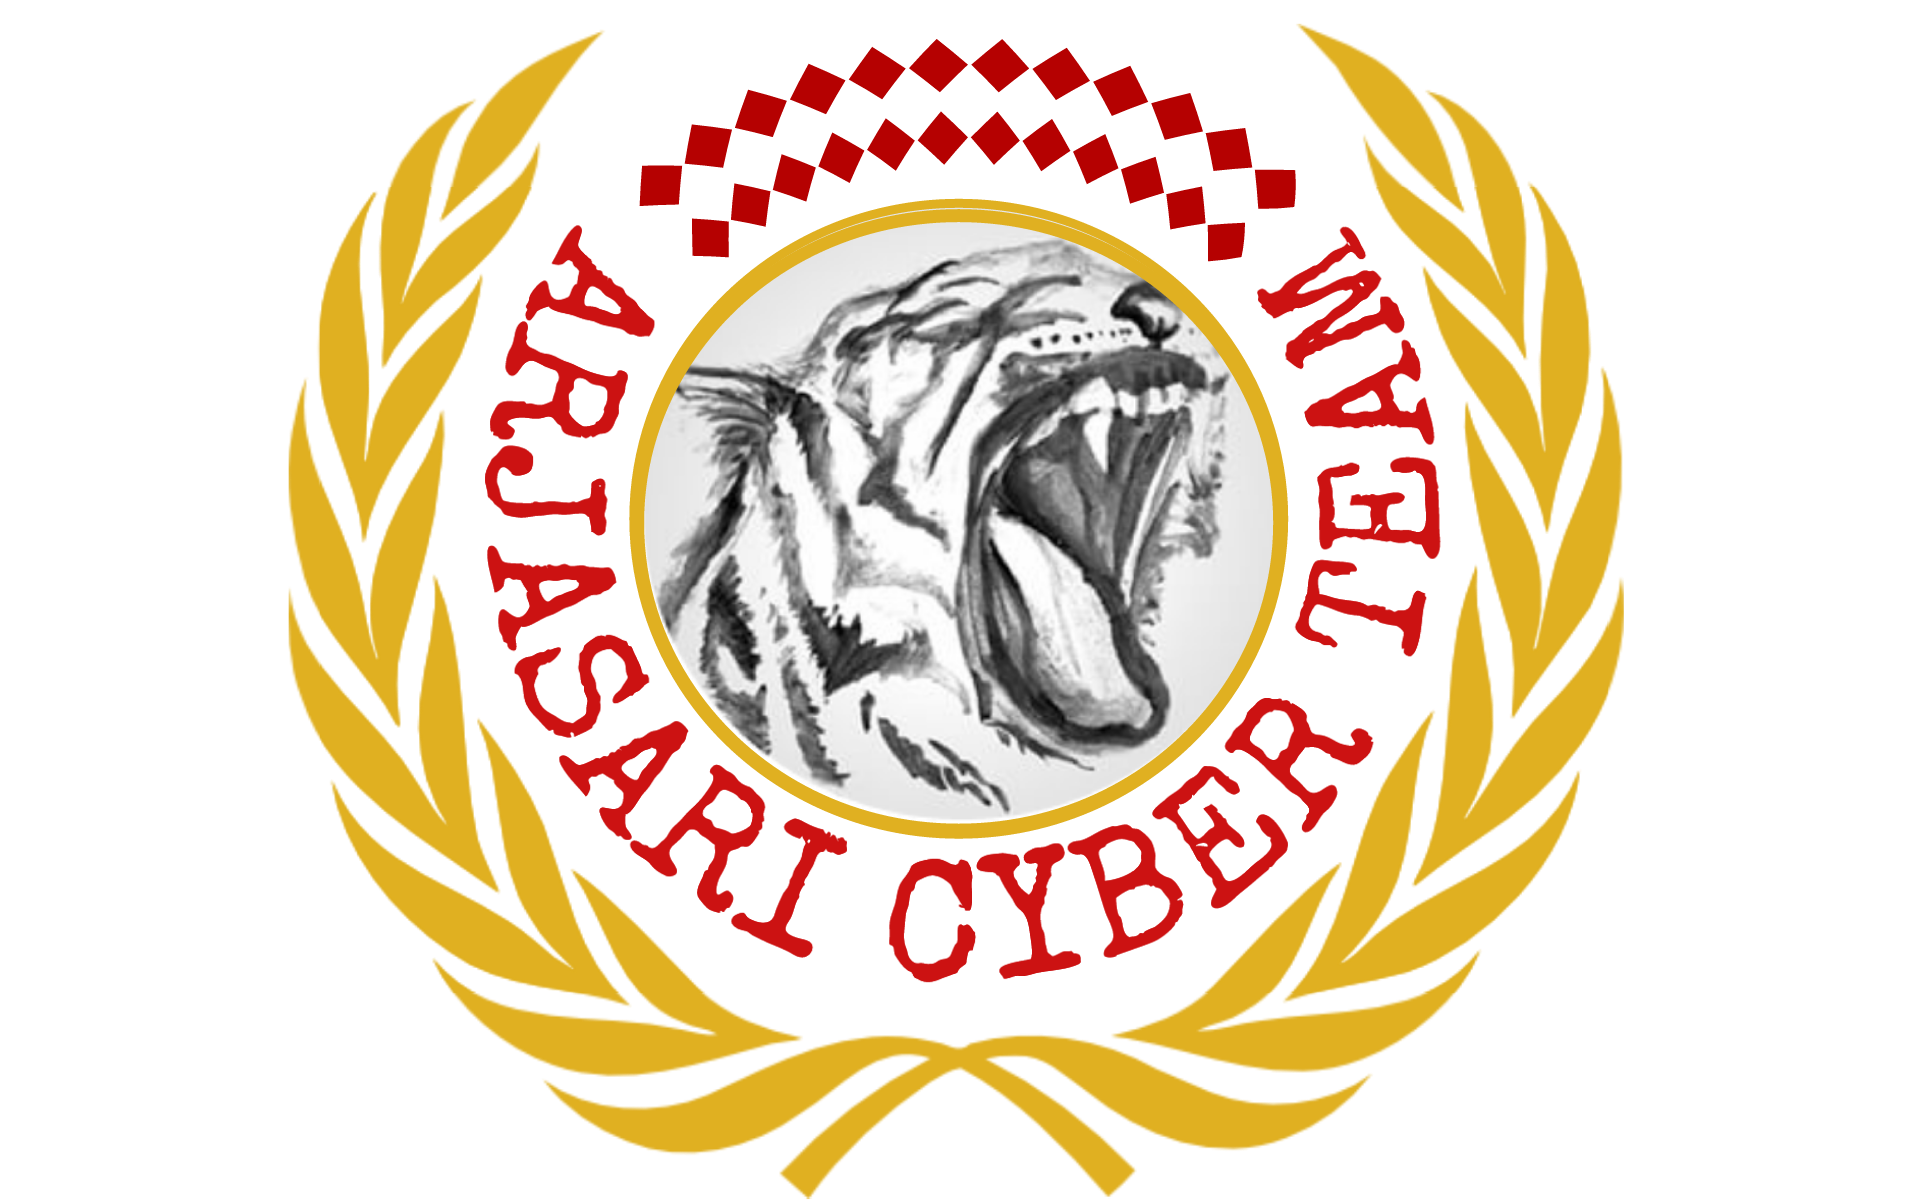 Arjasari Cyber Team